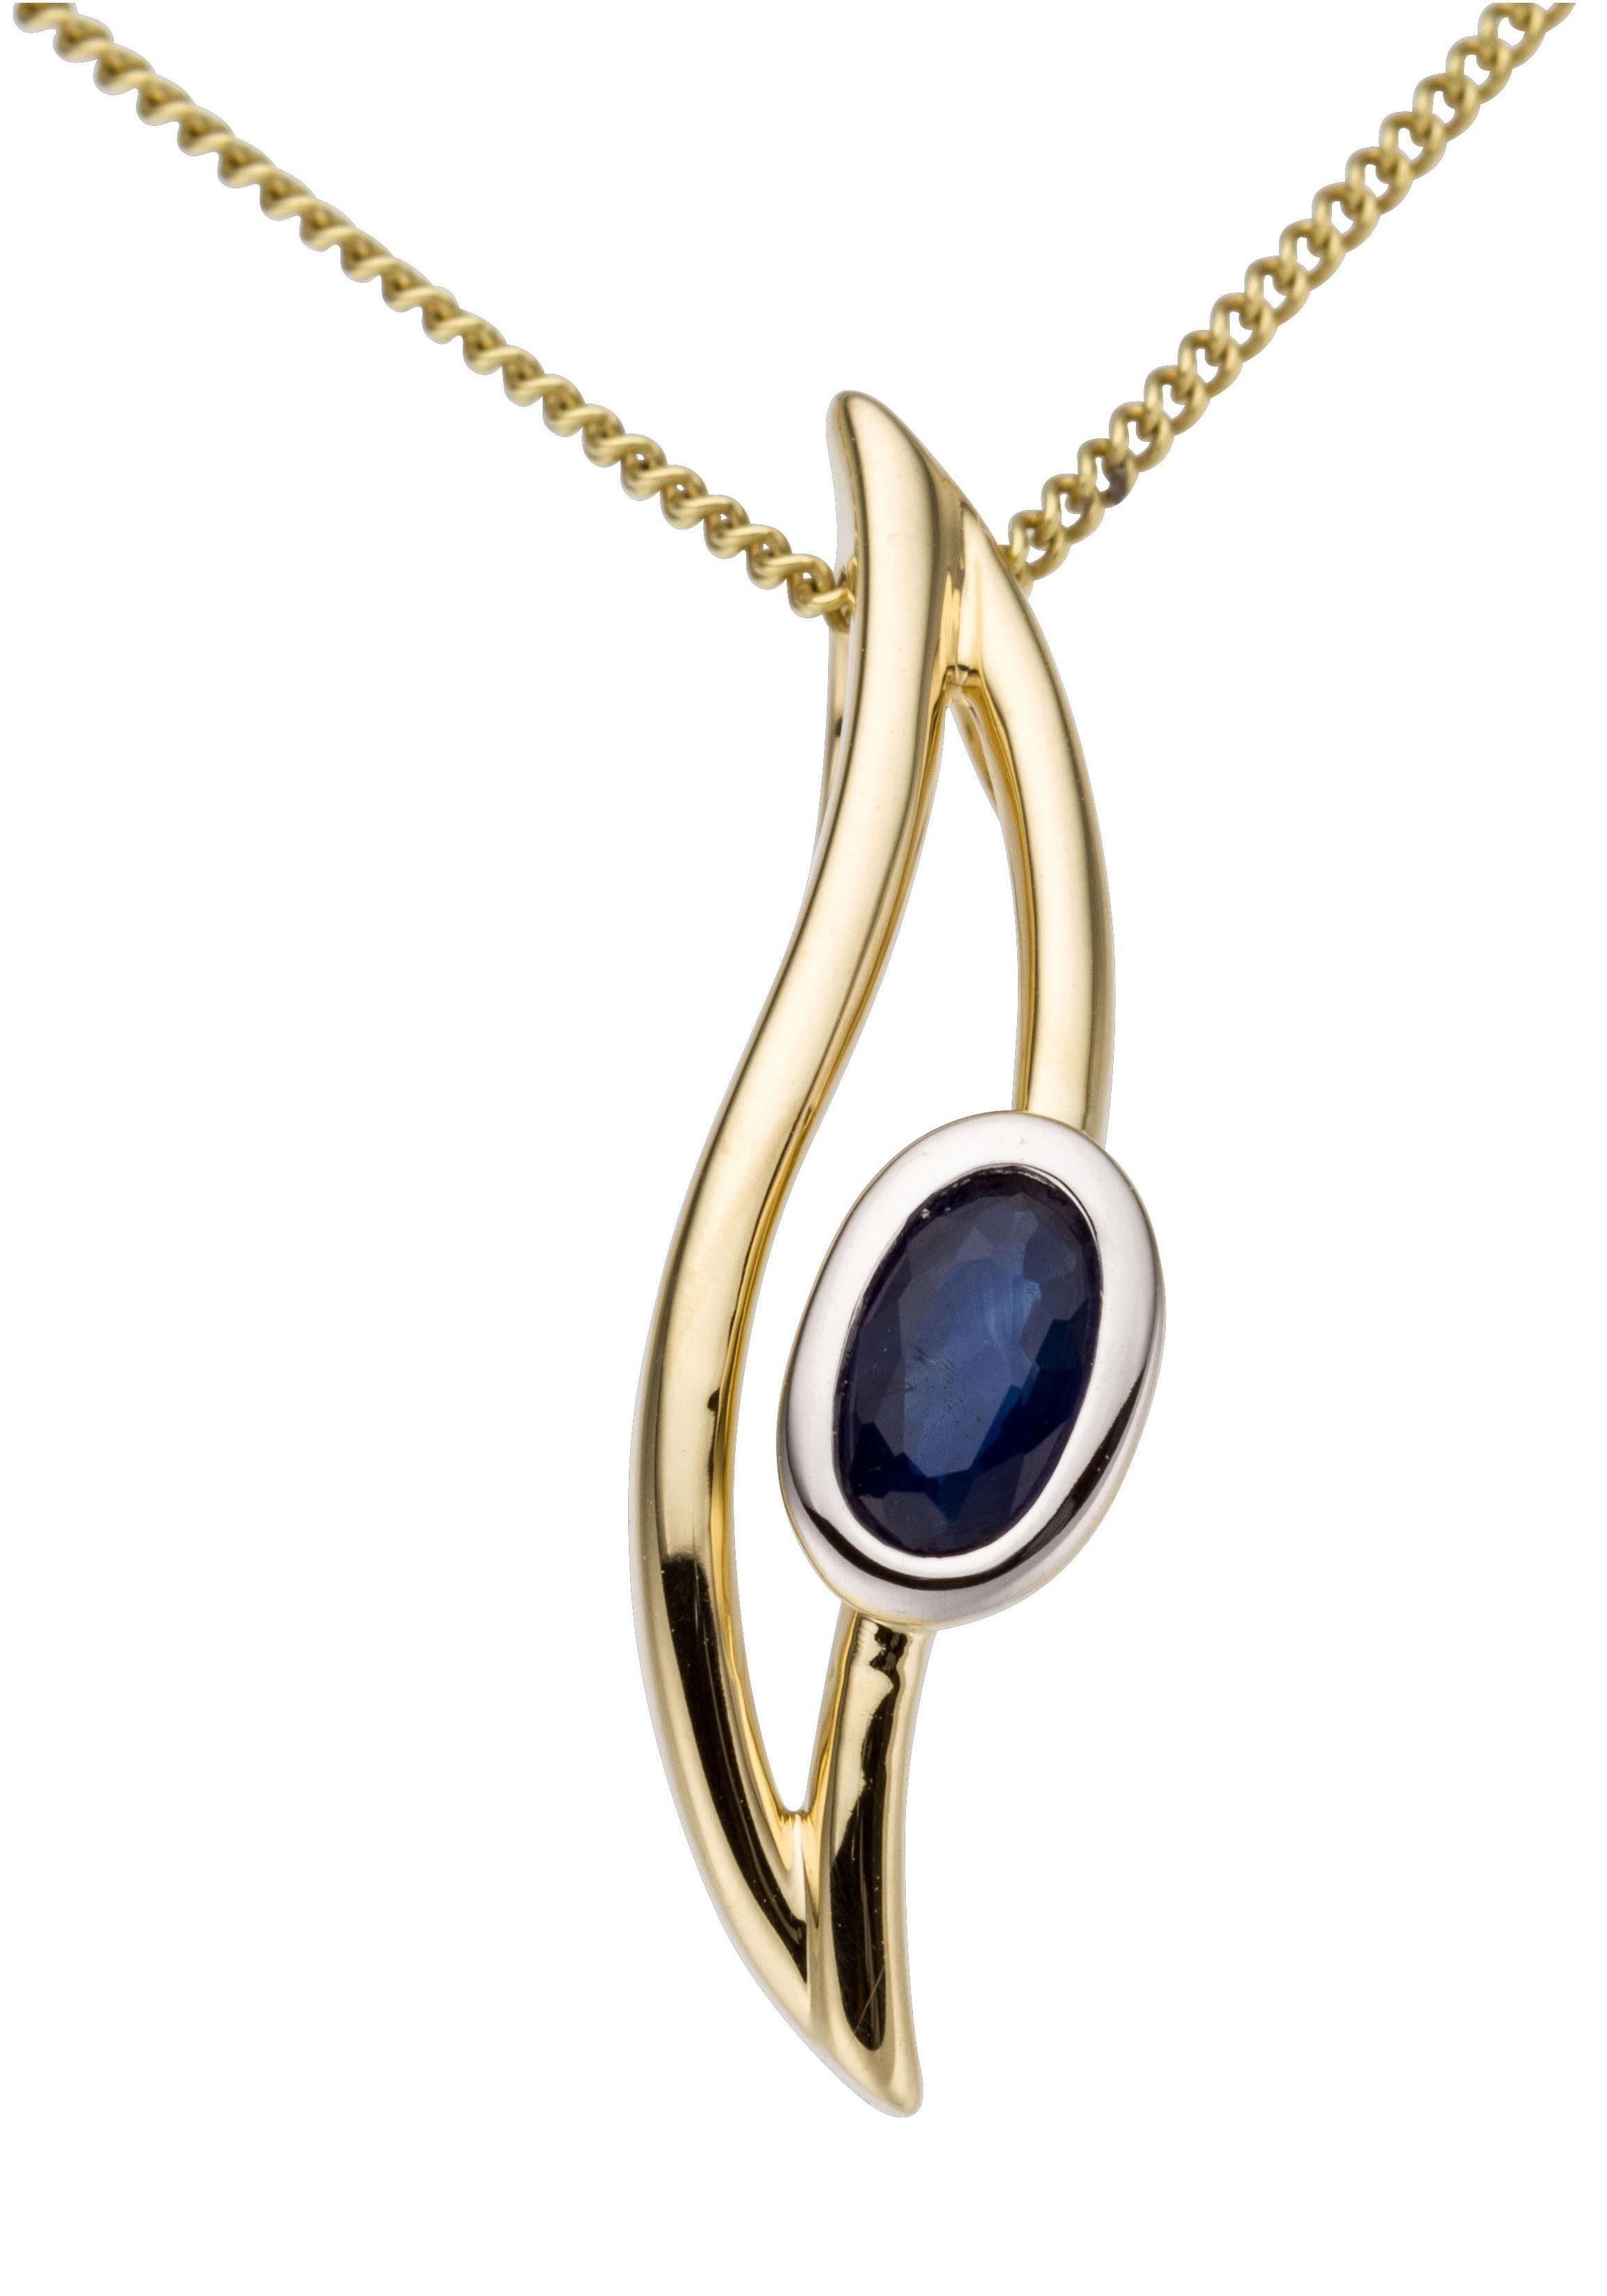 Firetti Kettenanhänger Oval rhodinierte Fassung glanz massiv | Schmuck > Halsketten > Kettenanhänger | Firetti